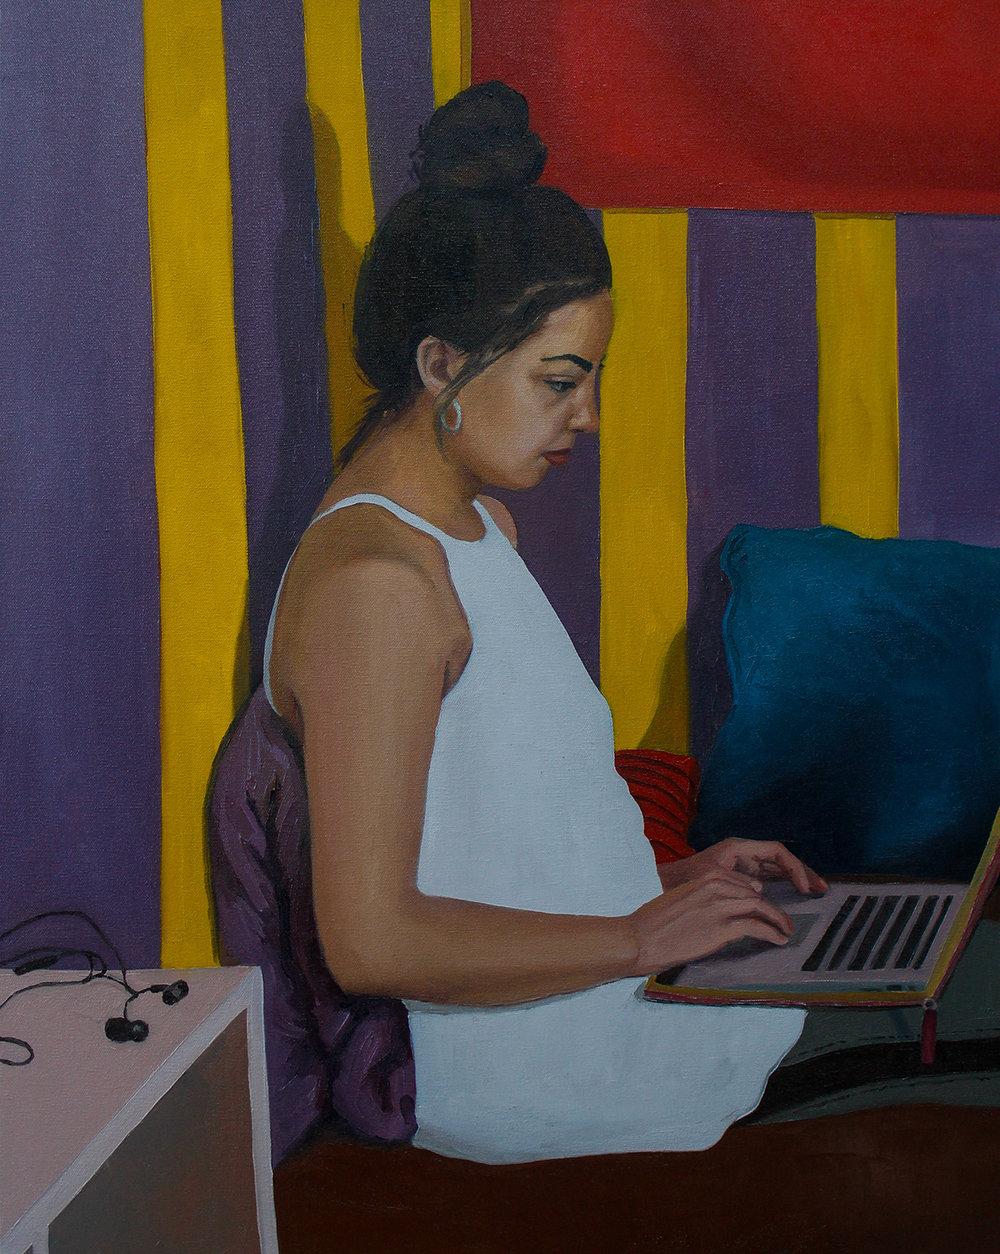 Sharraya   Oil on canvas 30 x 24 in